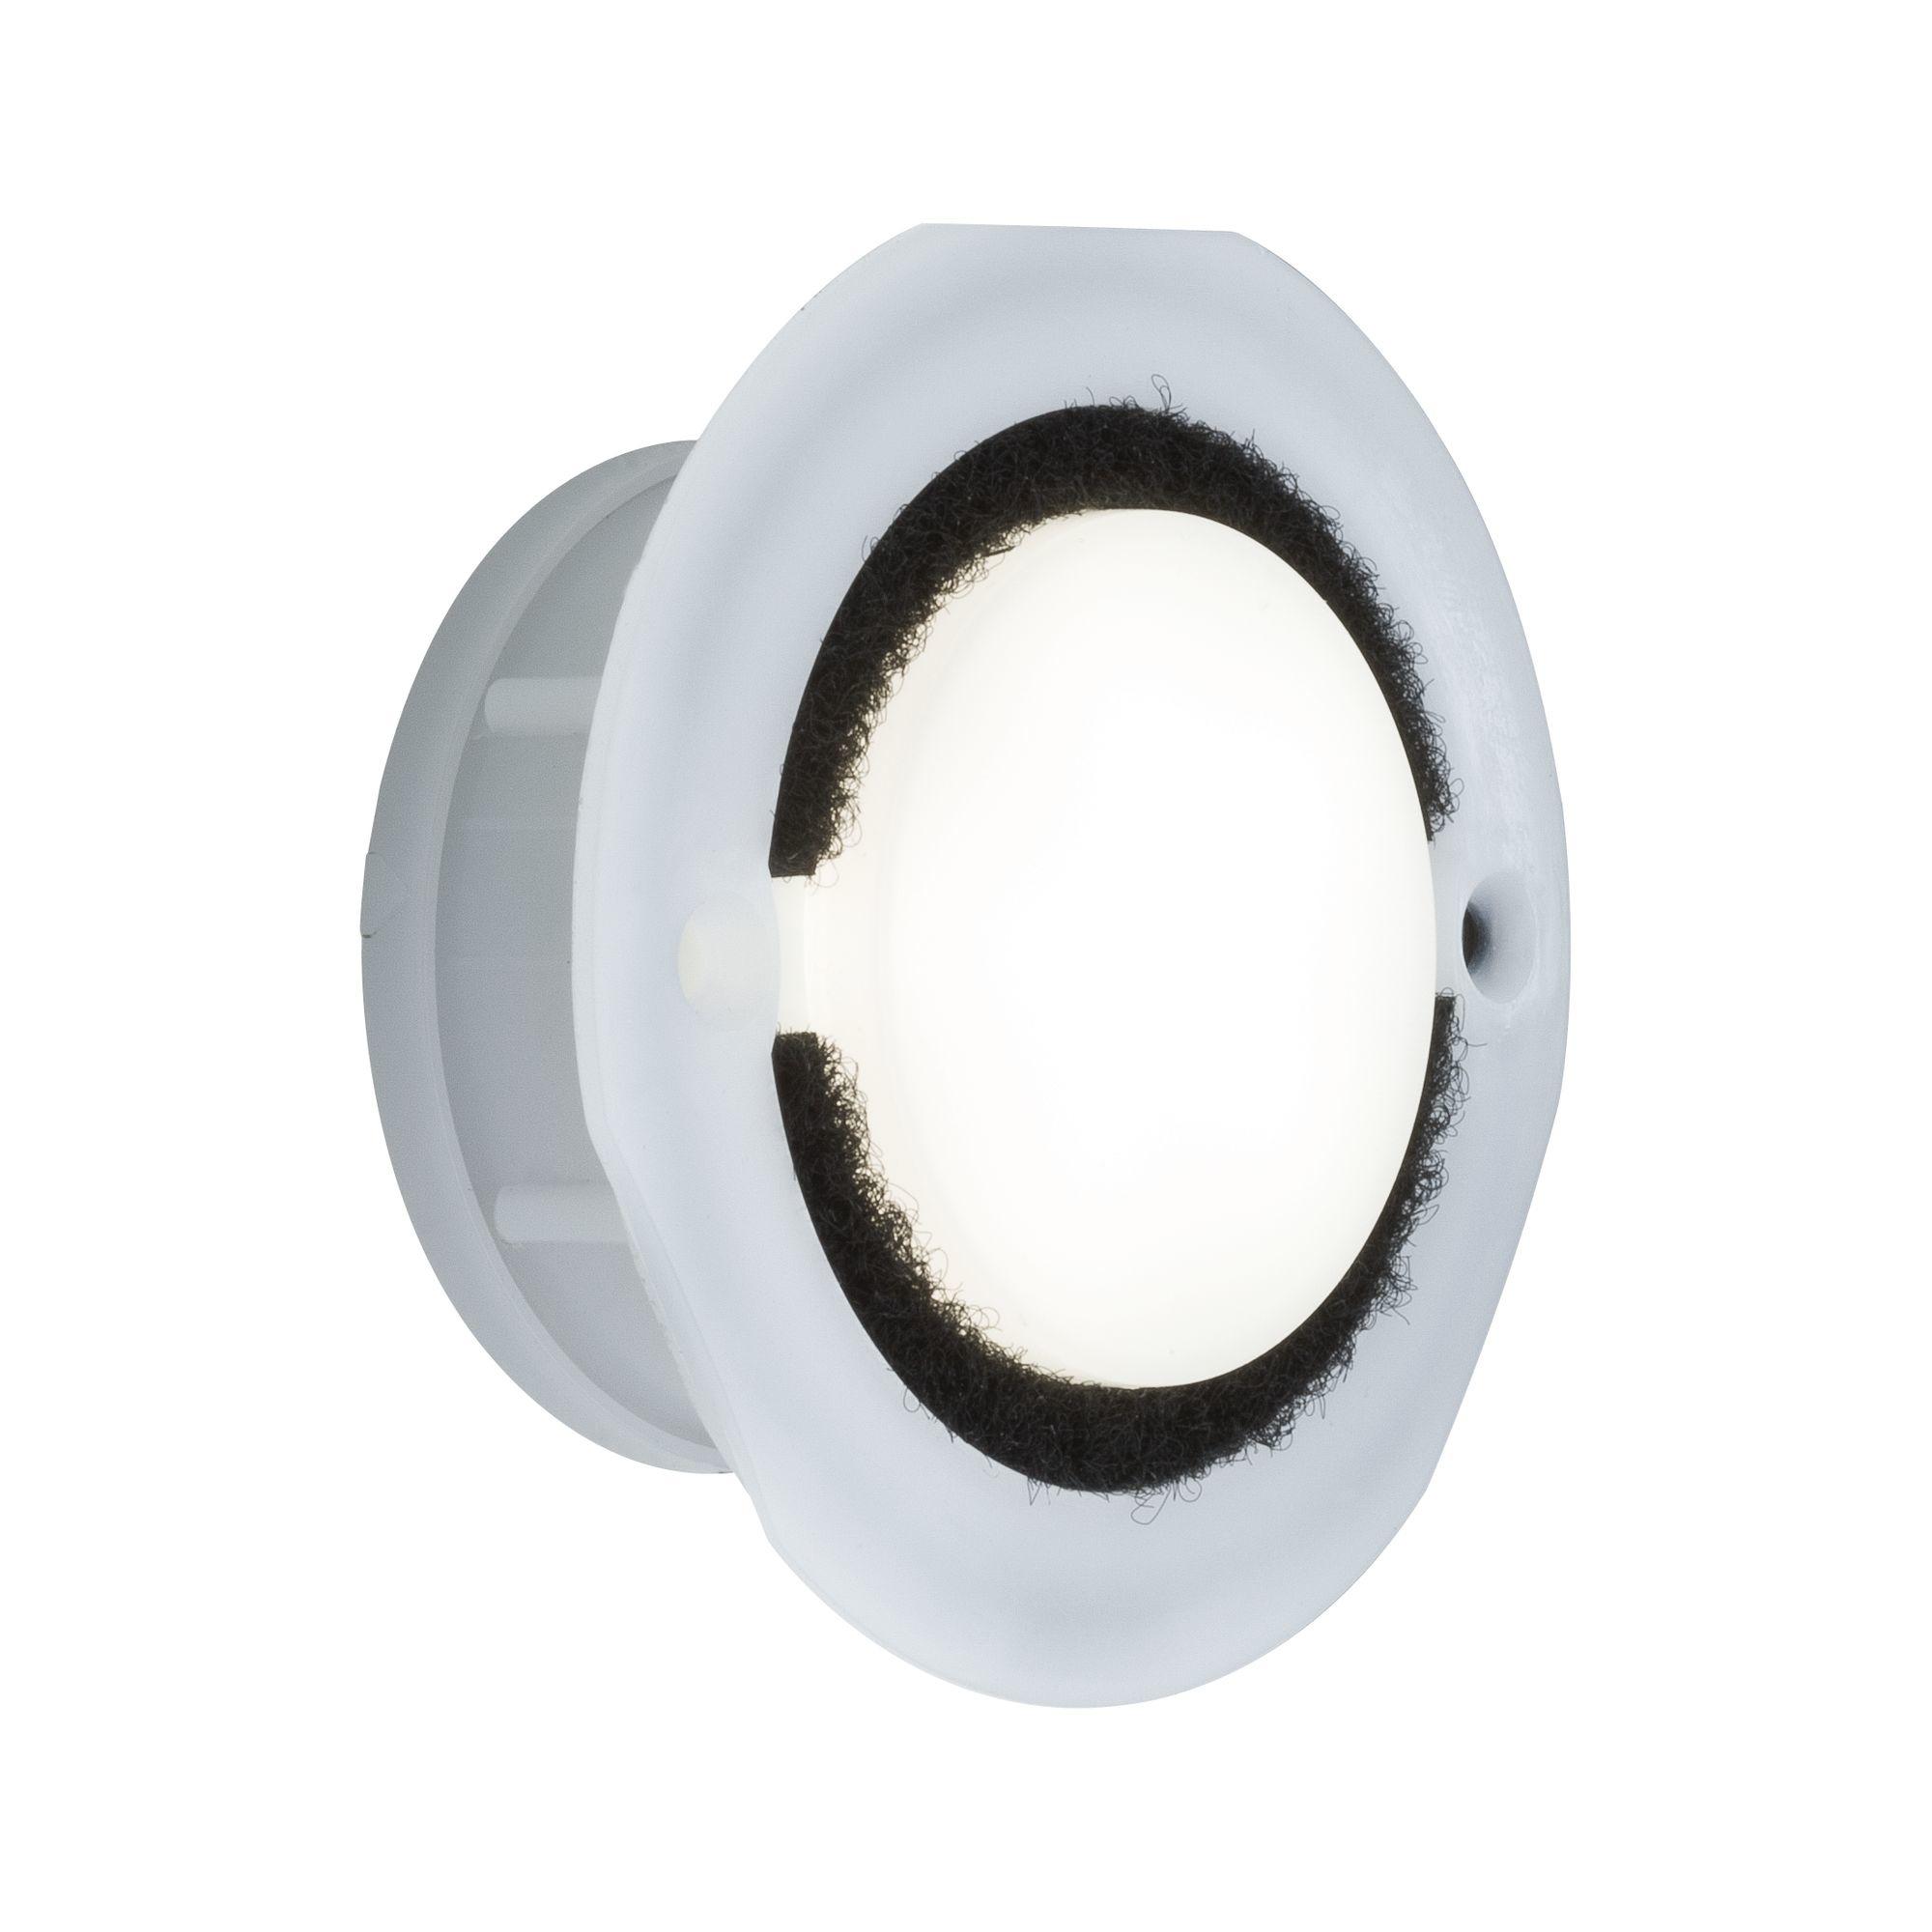 Paulmann Special EBL Set LED IP65 1,4W 4000K230V 76mm Opal